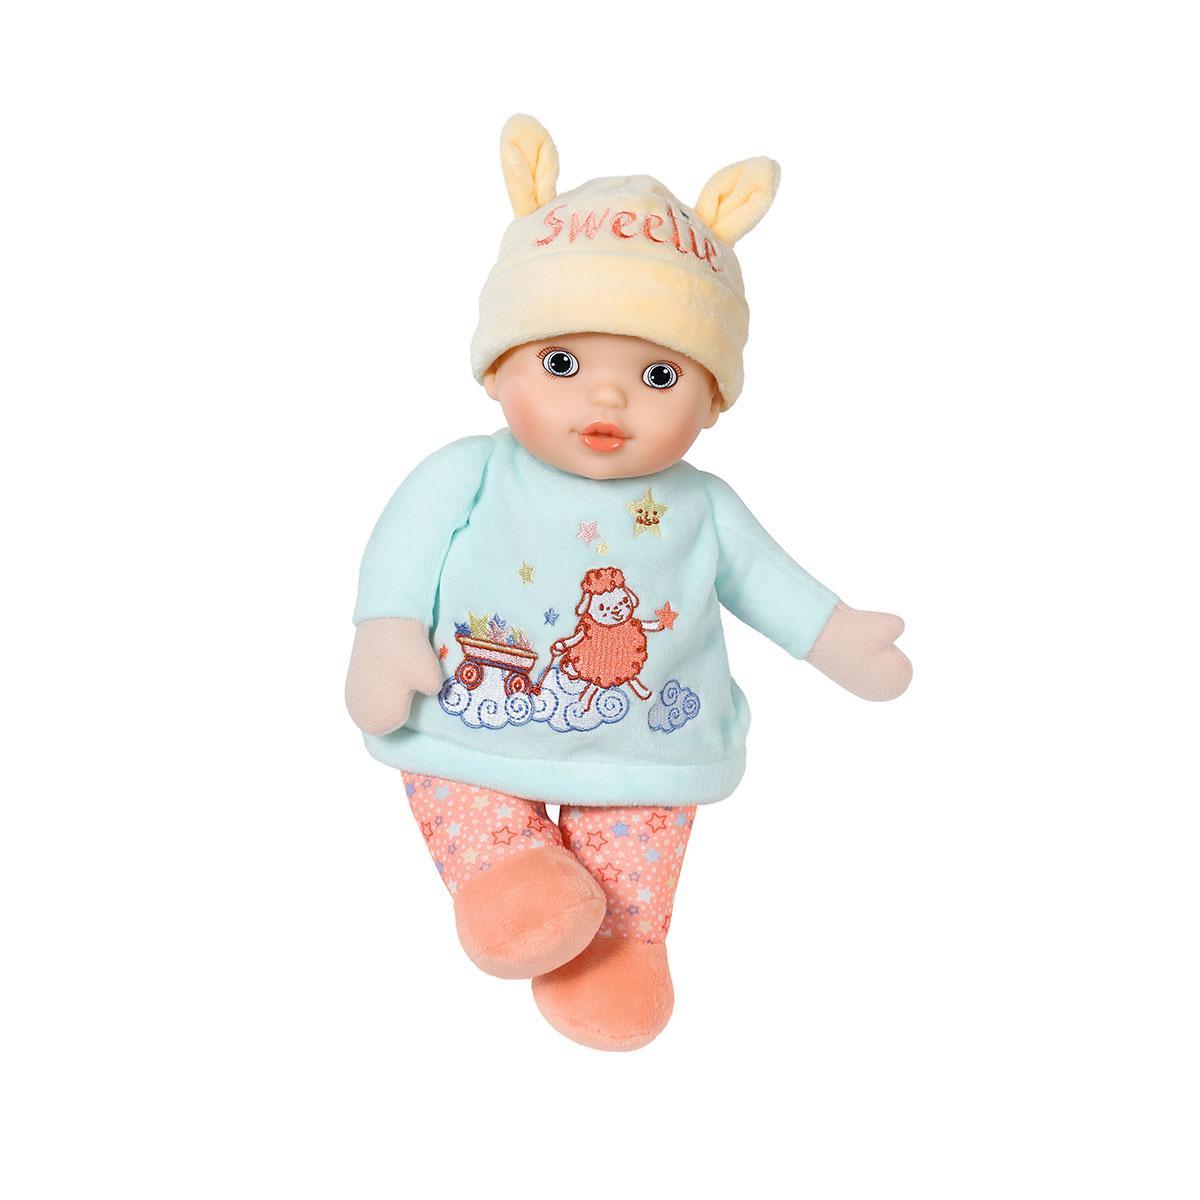 Кукла Baby Annabell Сладкая крошка - серии Для малышей, 702932